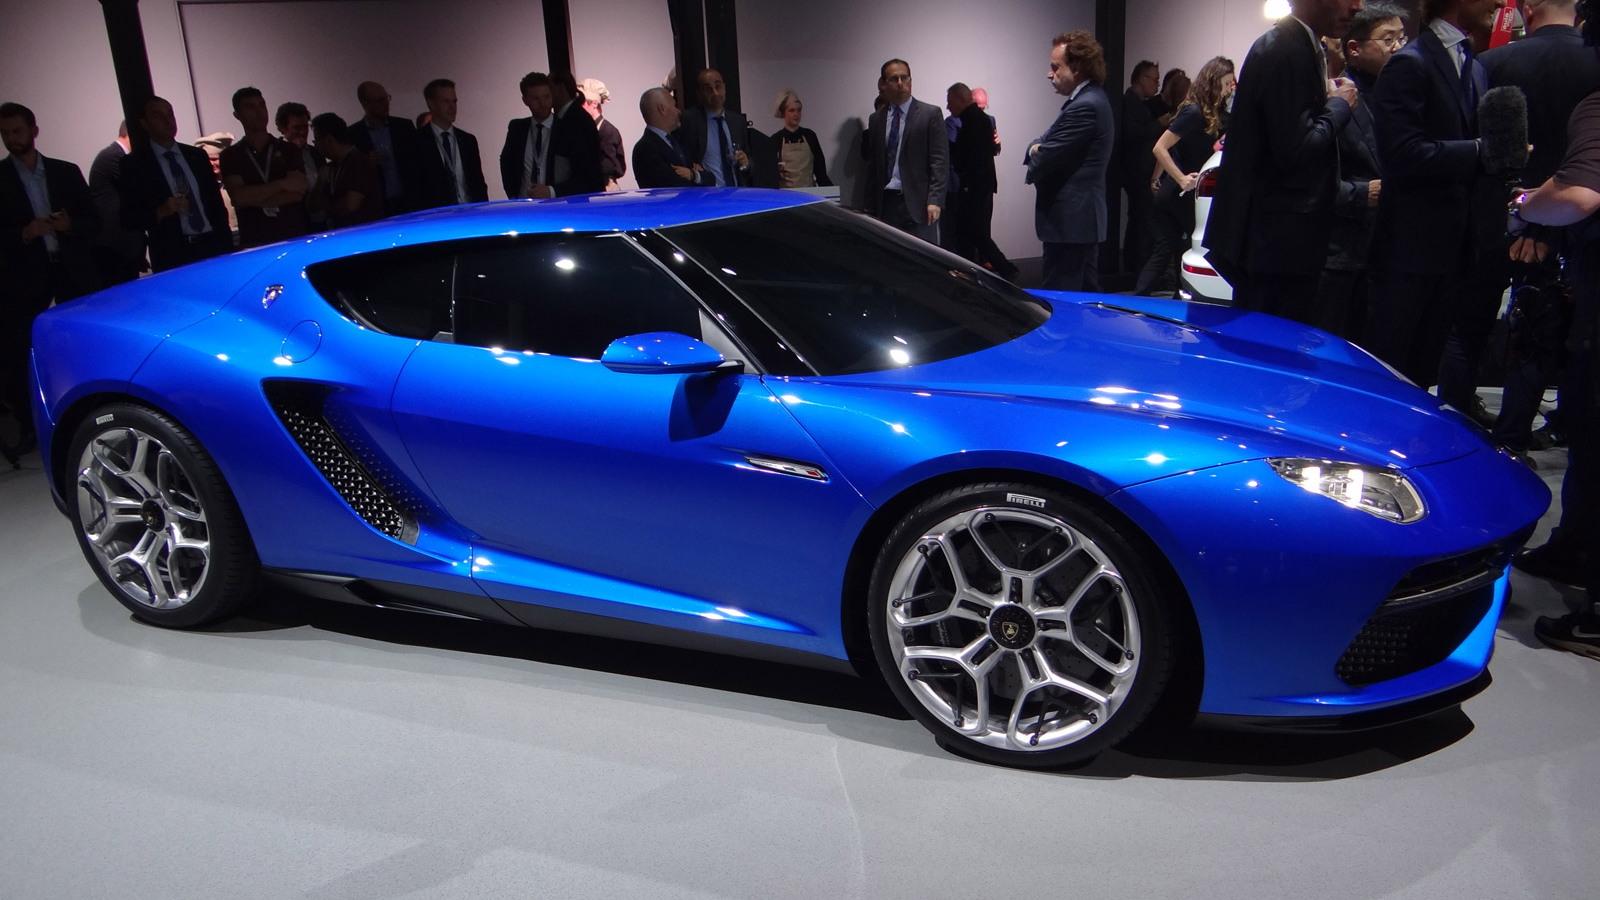 Lamborghini Asterion Lpi 910 4 Concept 2017 Paris Auto Show